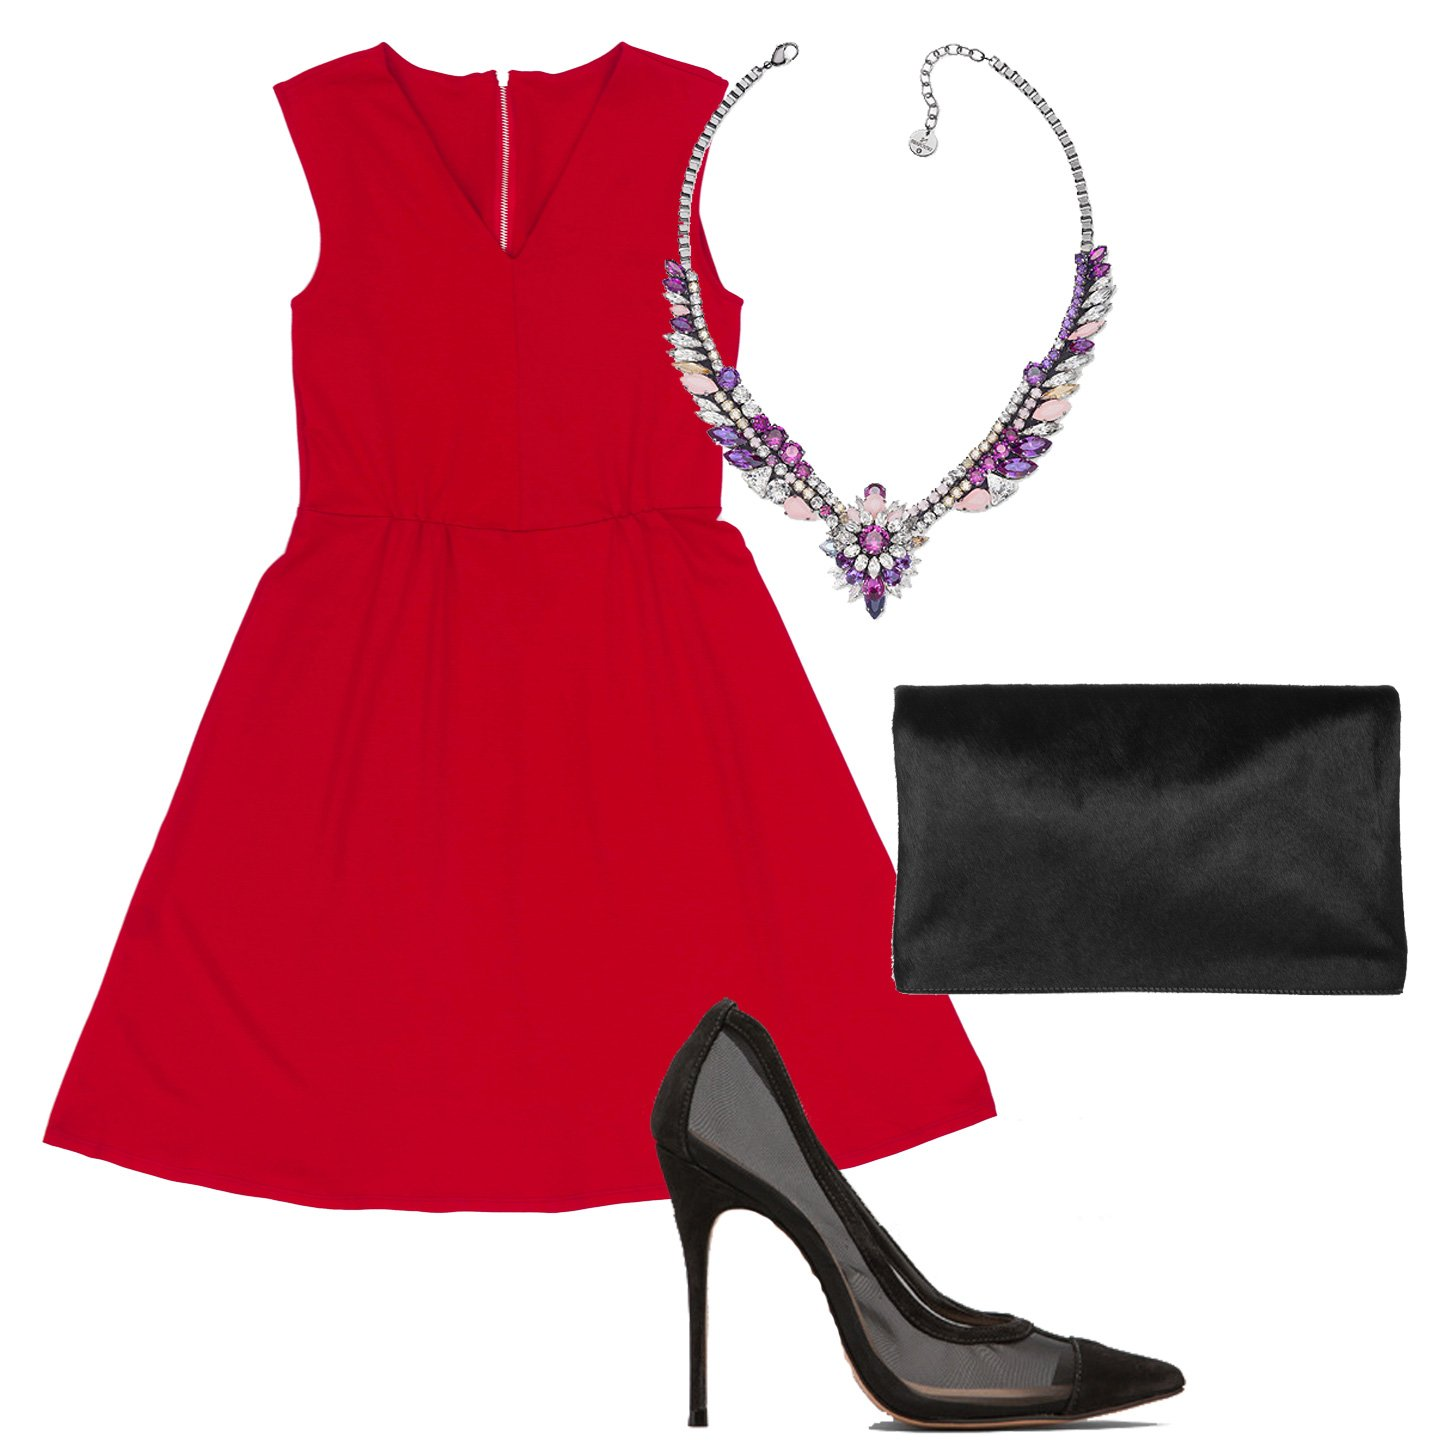 red-dress-aline-black-shoe-pumps-bib-necklace-black-bag-clutch-howtowear-valentinesday-outfit-fall-winter-dinner.jpg